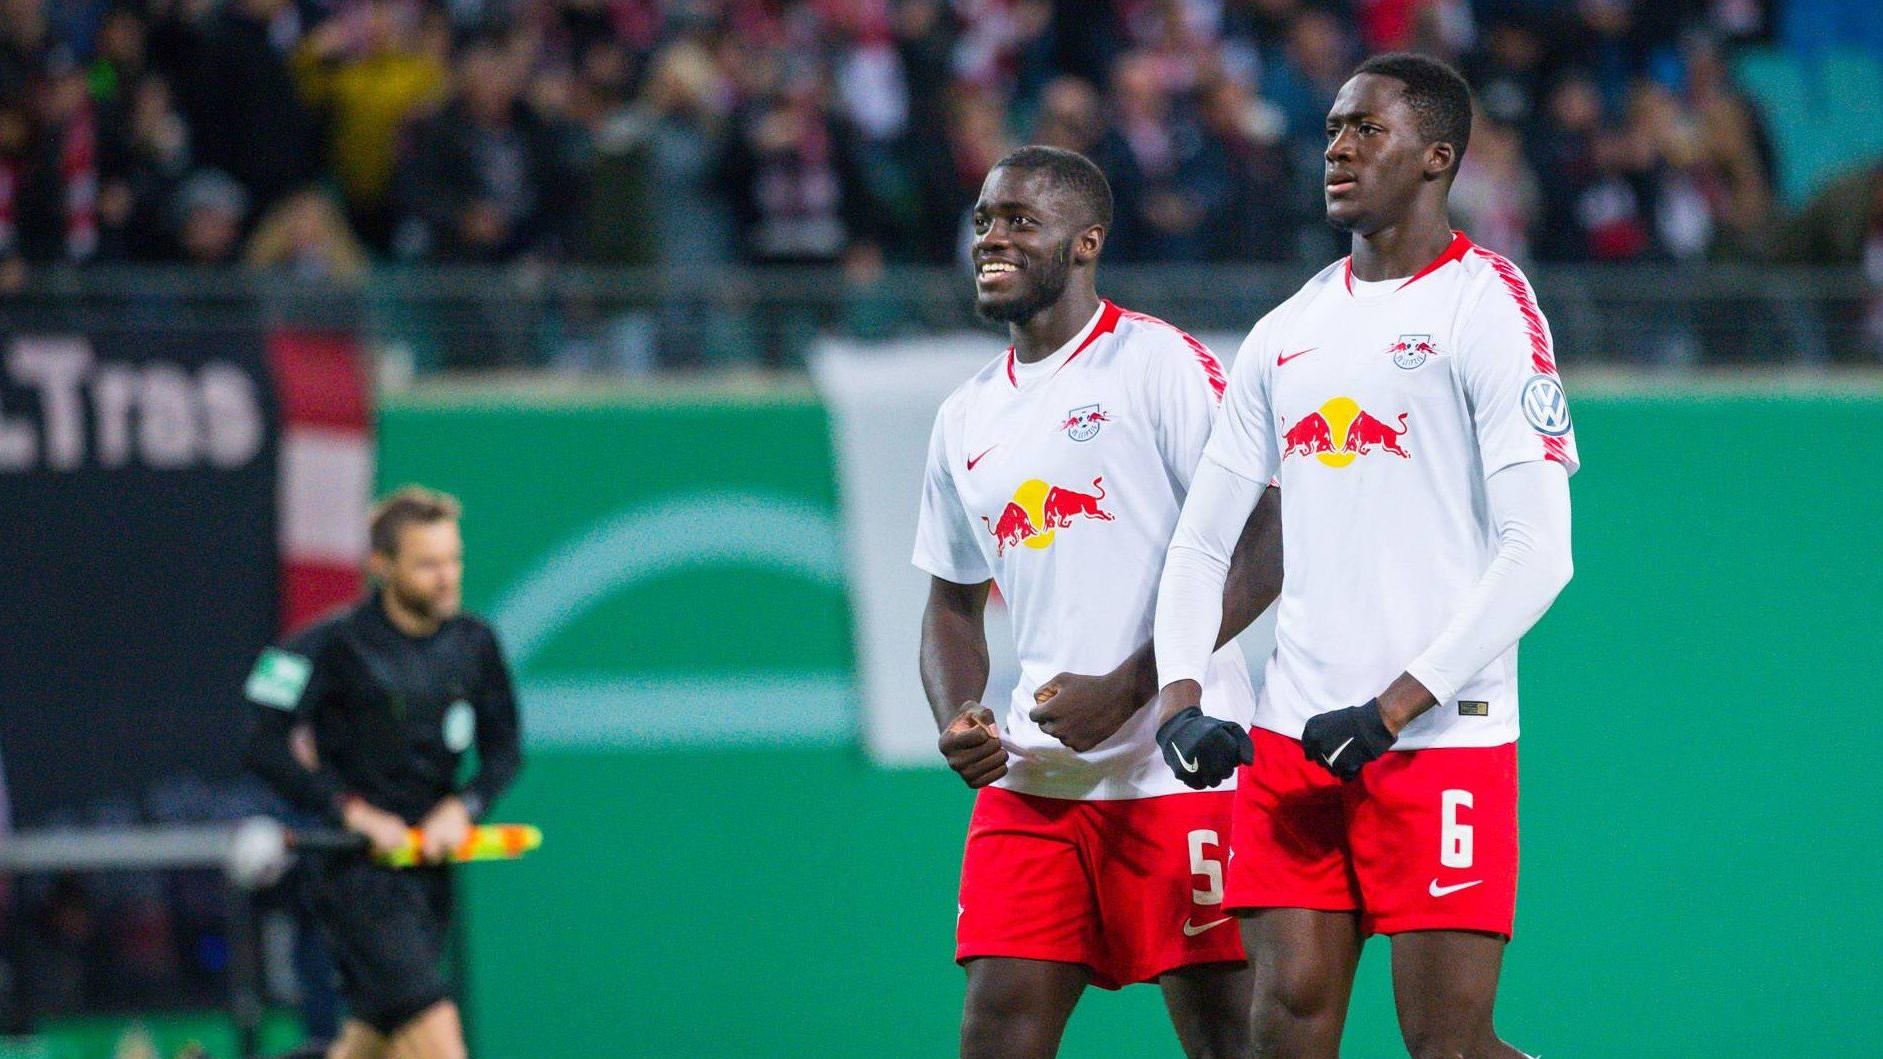 Bundesliga | Dayot Upamecano and Ibrahima Konate: RB Leipzig and France's  future in defence